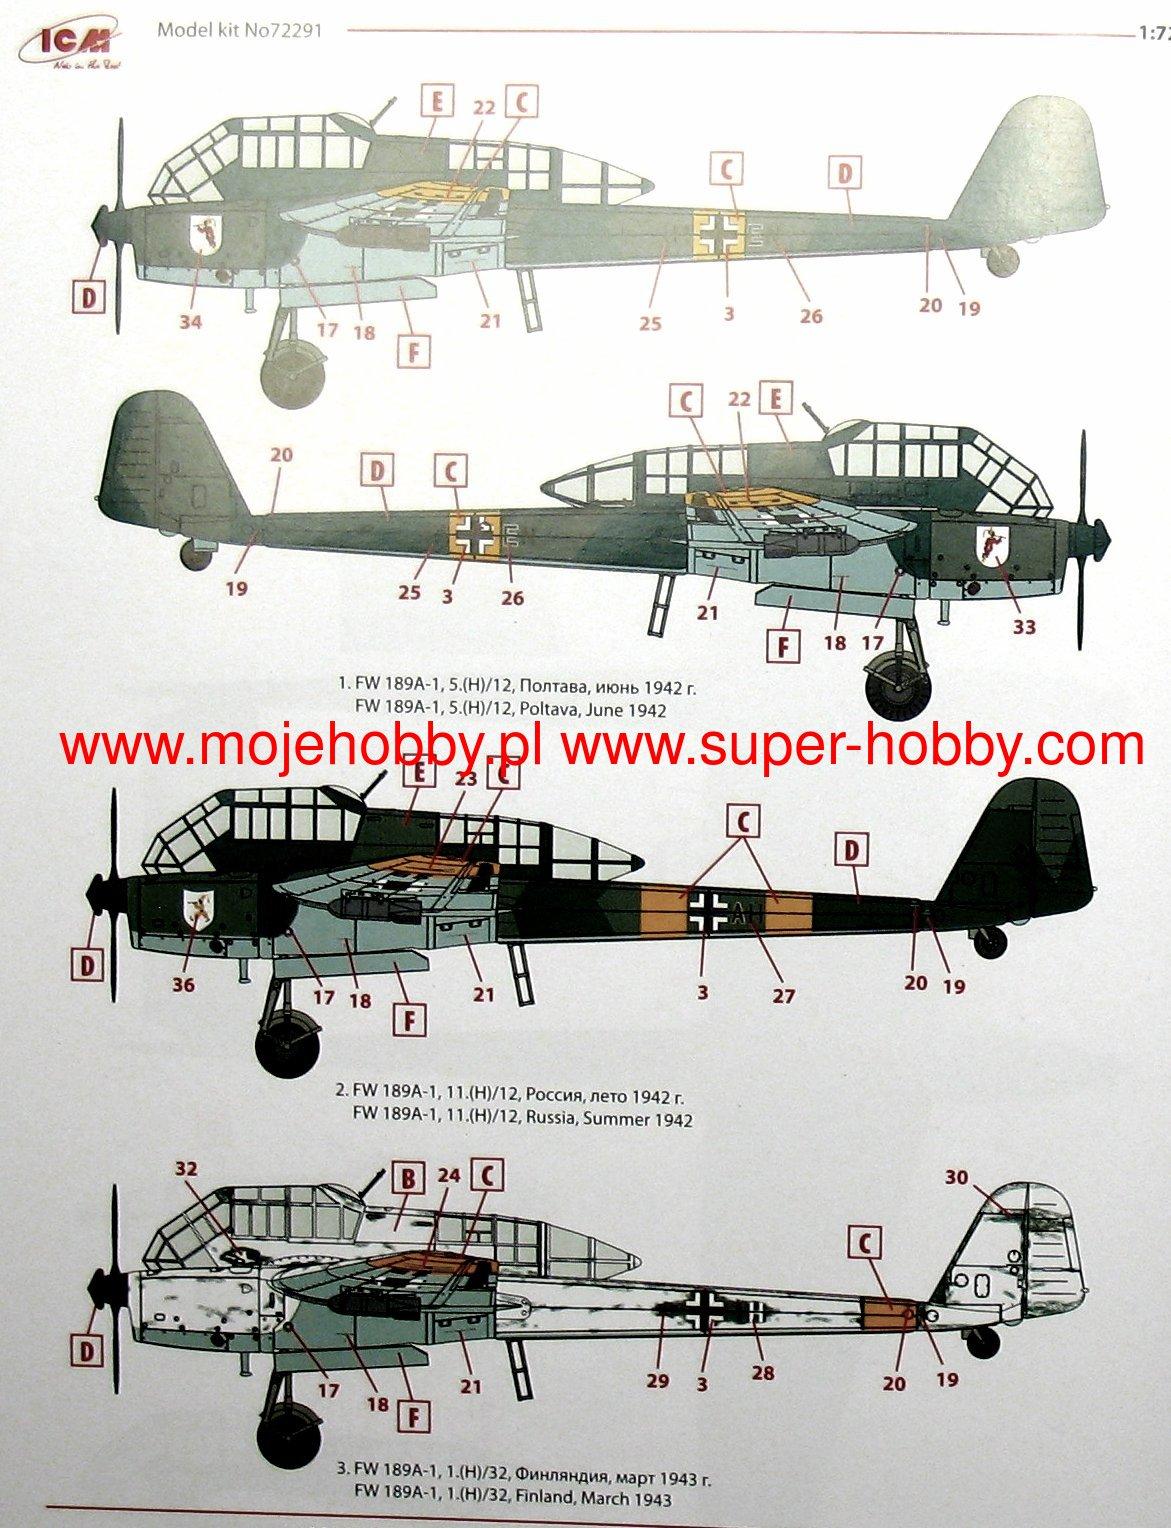 fw 189a-1 ww2 german reconnaisance plane icm 72291